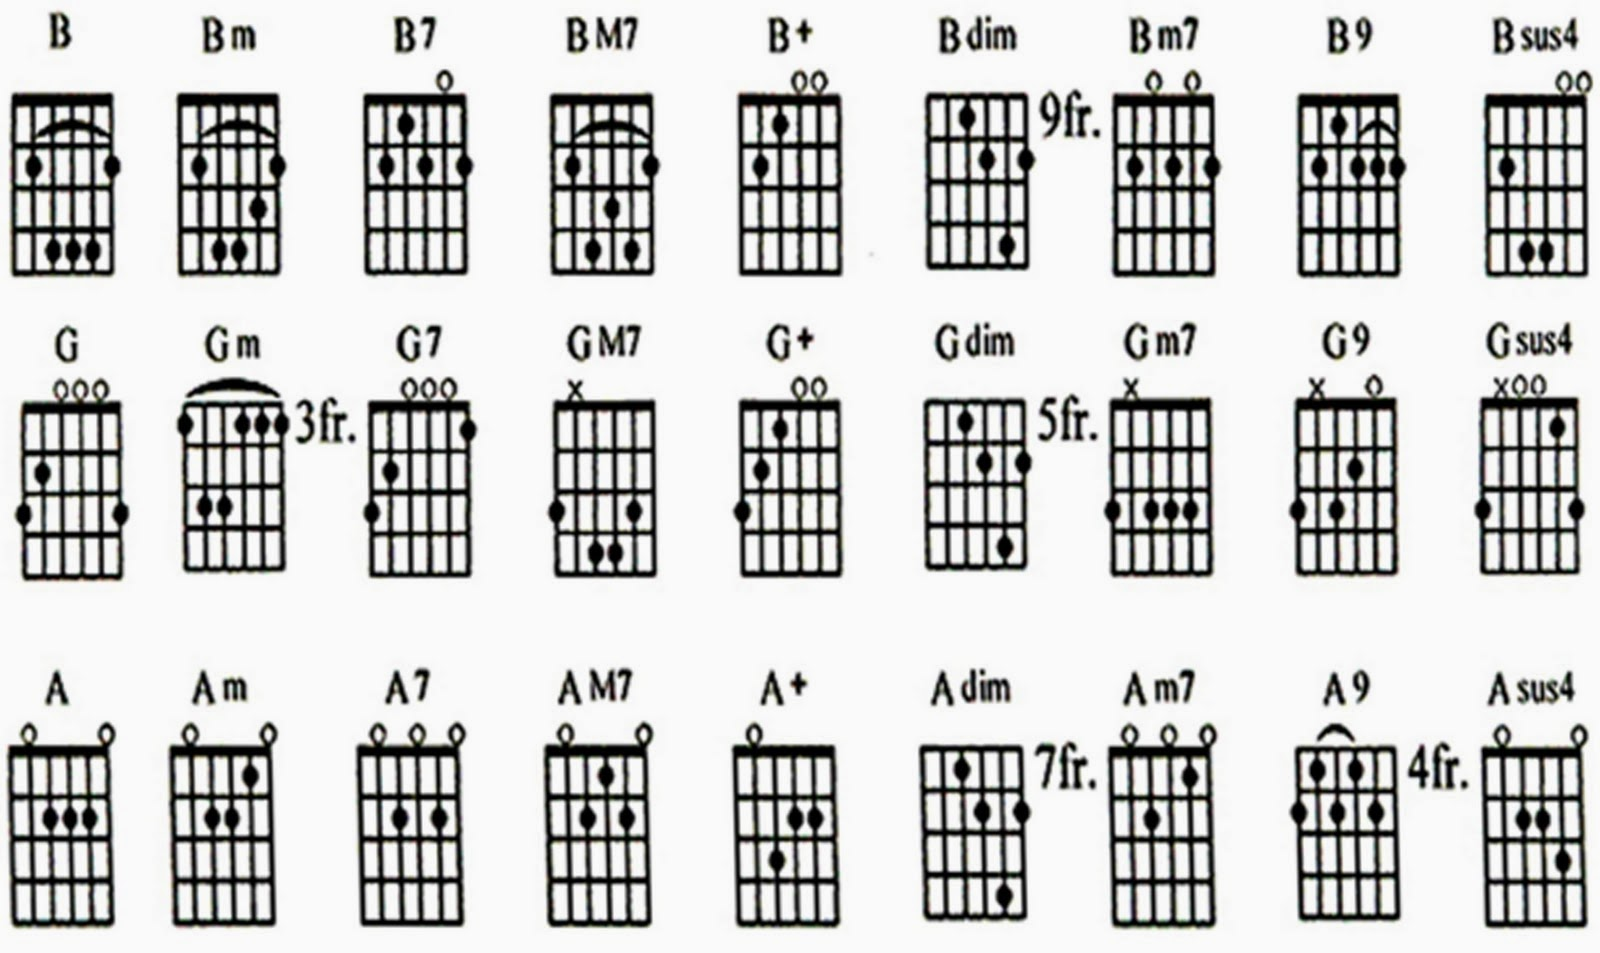 Lirik dan kunci gitar pemula ini chord bisa di gunakan sebagai pacuan untuk belajar gitar bagi pemula belajar kunci em am a d dm g c dan b dahulu ya reheart Choice Image